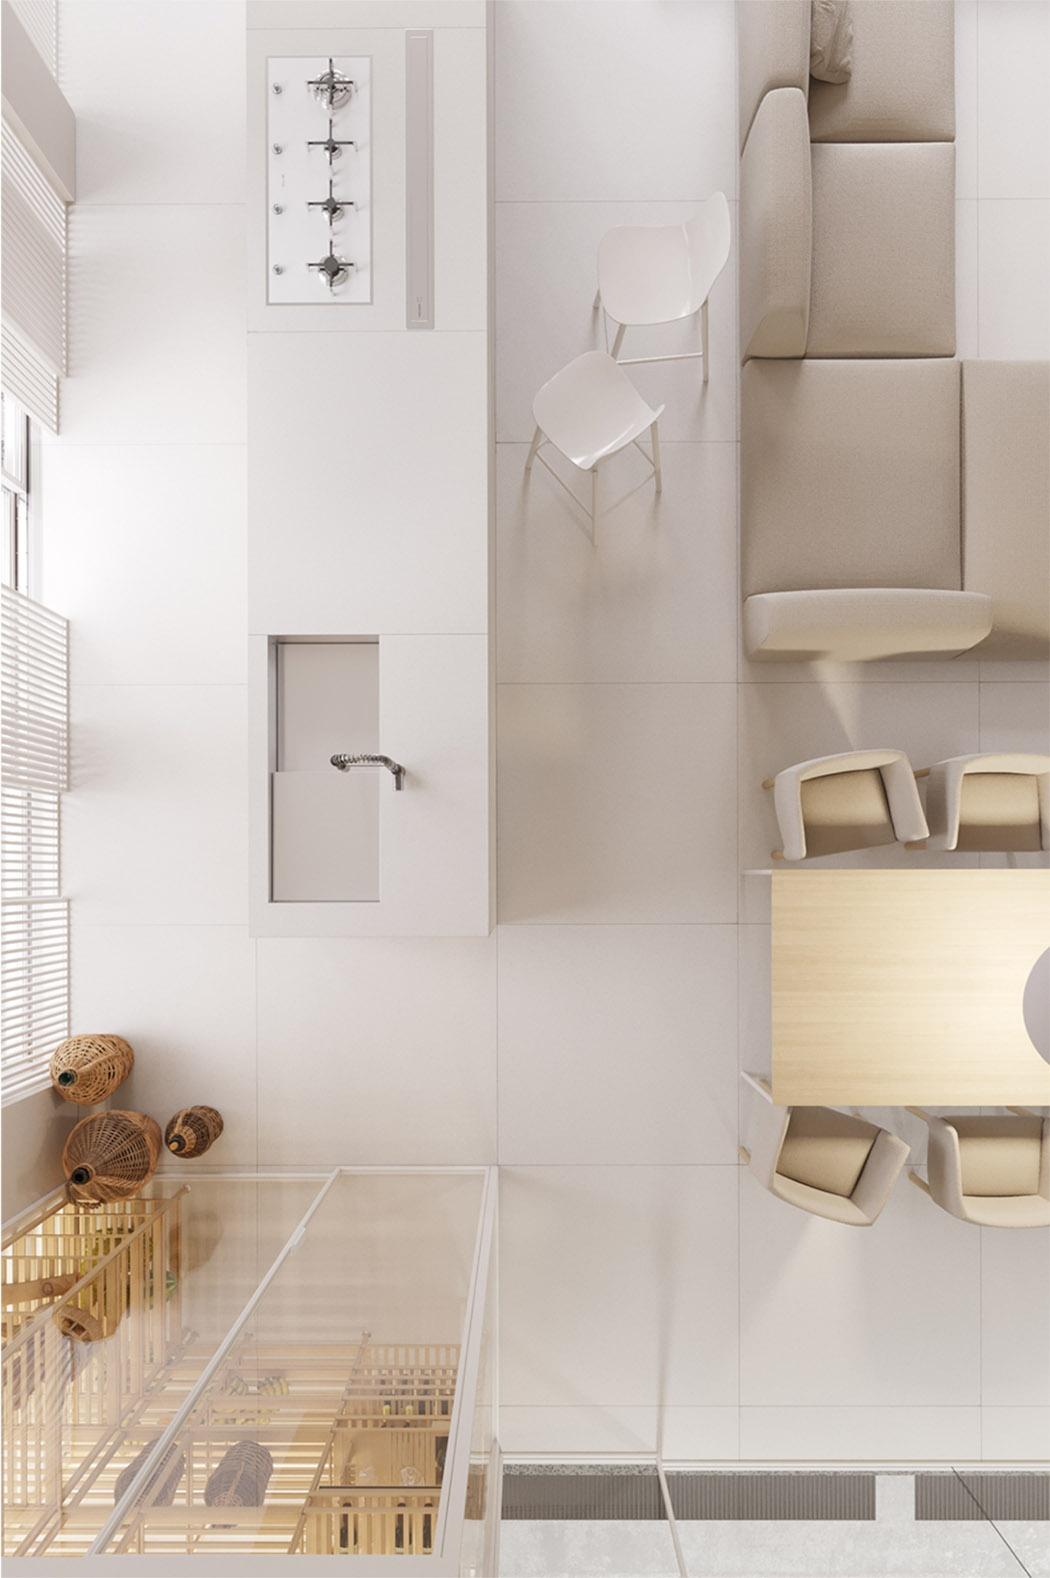 igor-sirotov-architects-ps3h-12